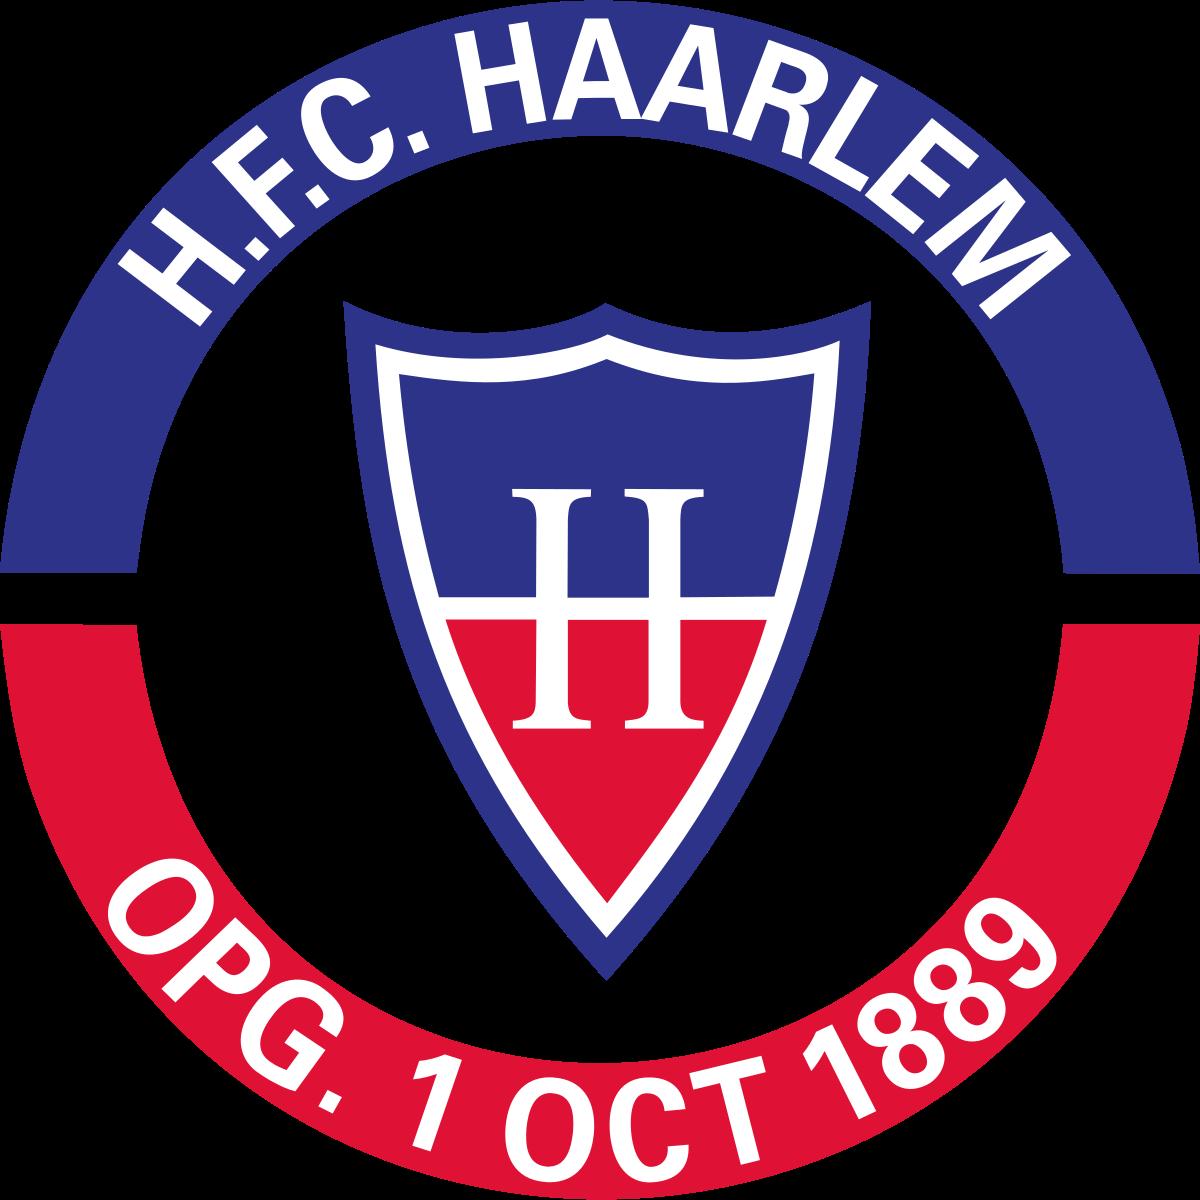 HFC Haarlem logo